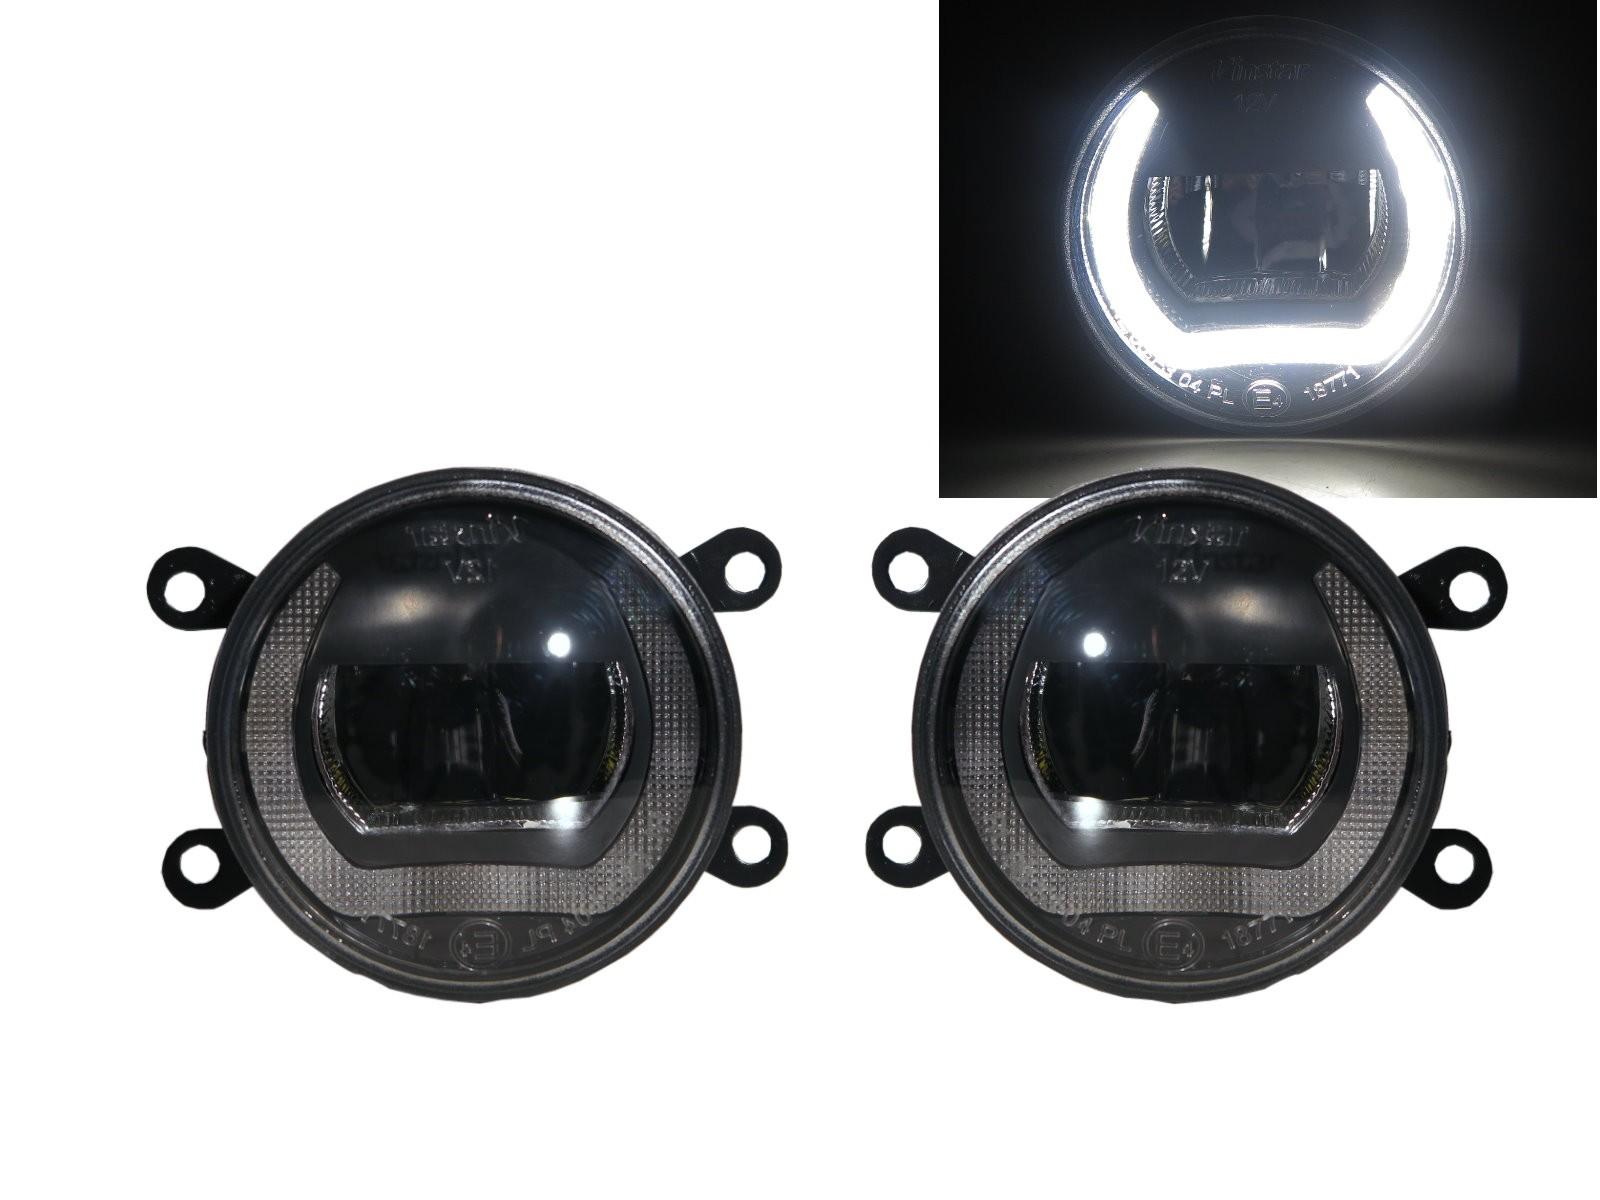 CrazyTheGod SANDERO 2008-Present Hatchback 5D DRL Ubar LED Glass Fog Light Lamp Black for DACIA